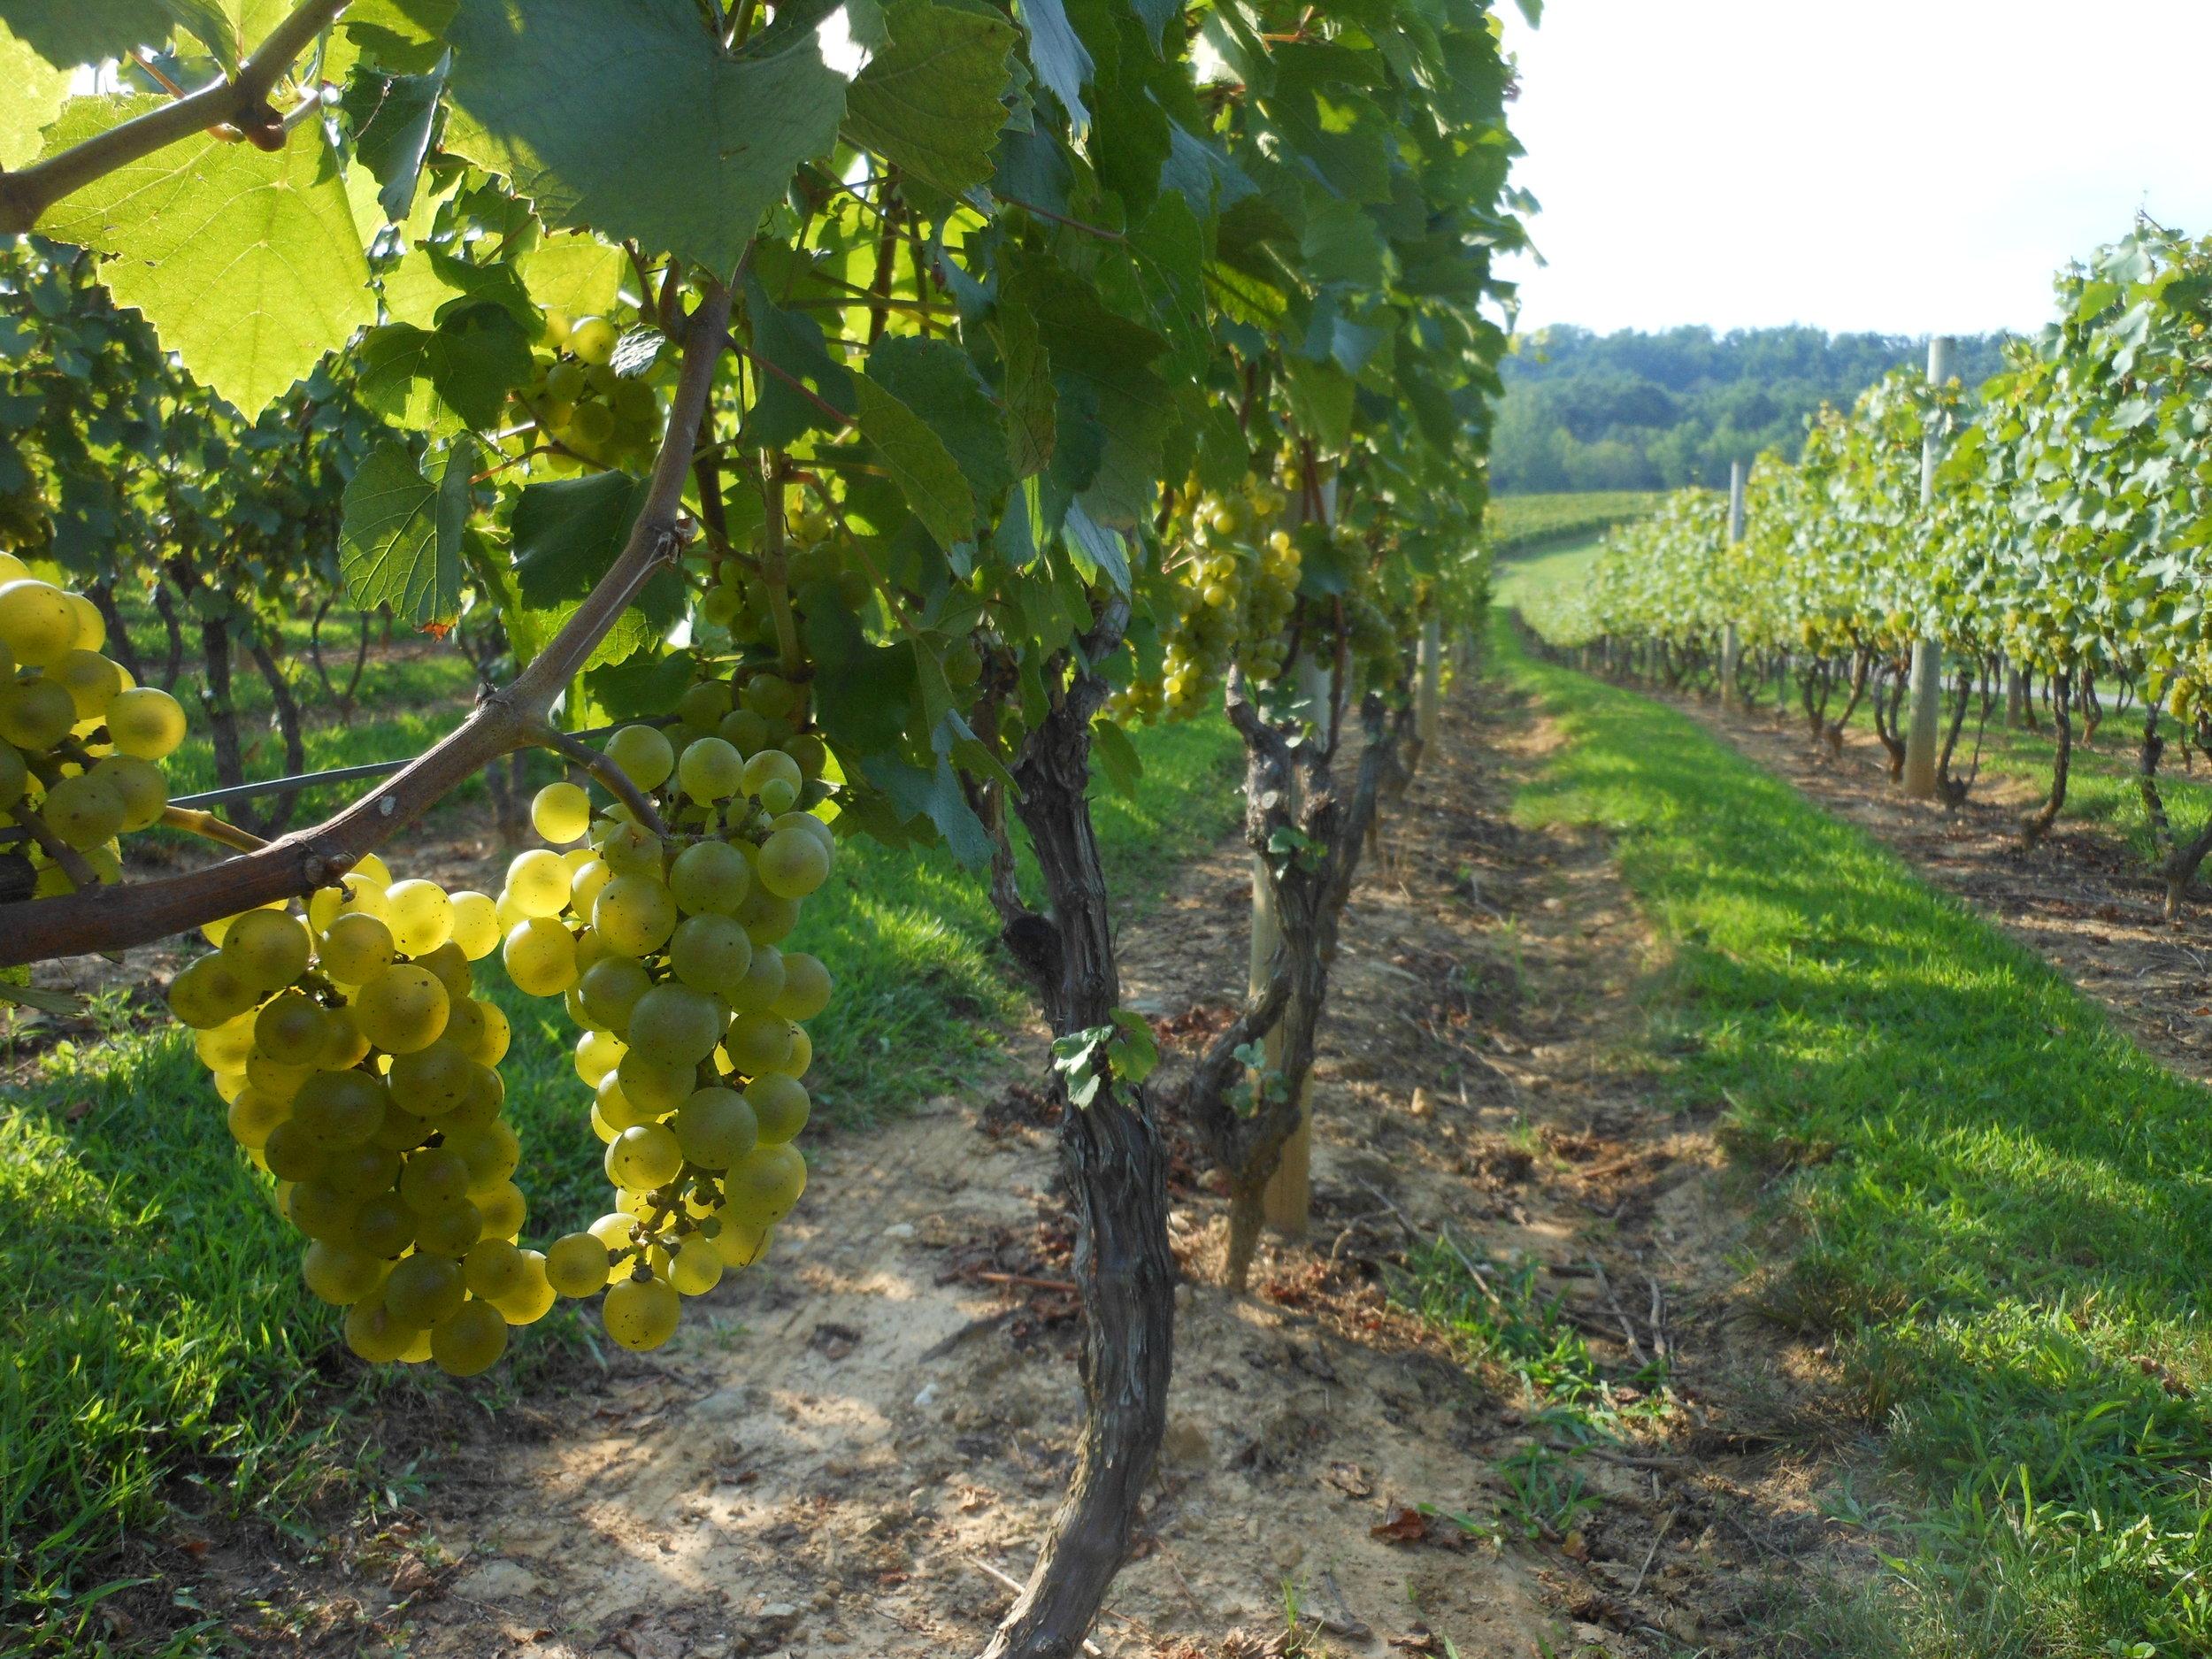 Alba Vineyard & Winery Chardonnay grapes